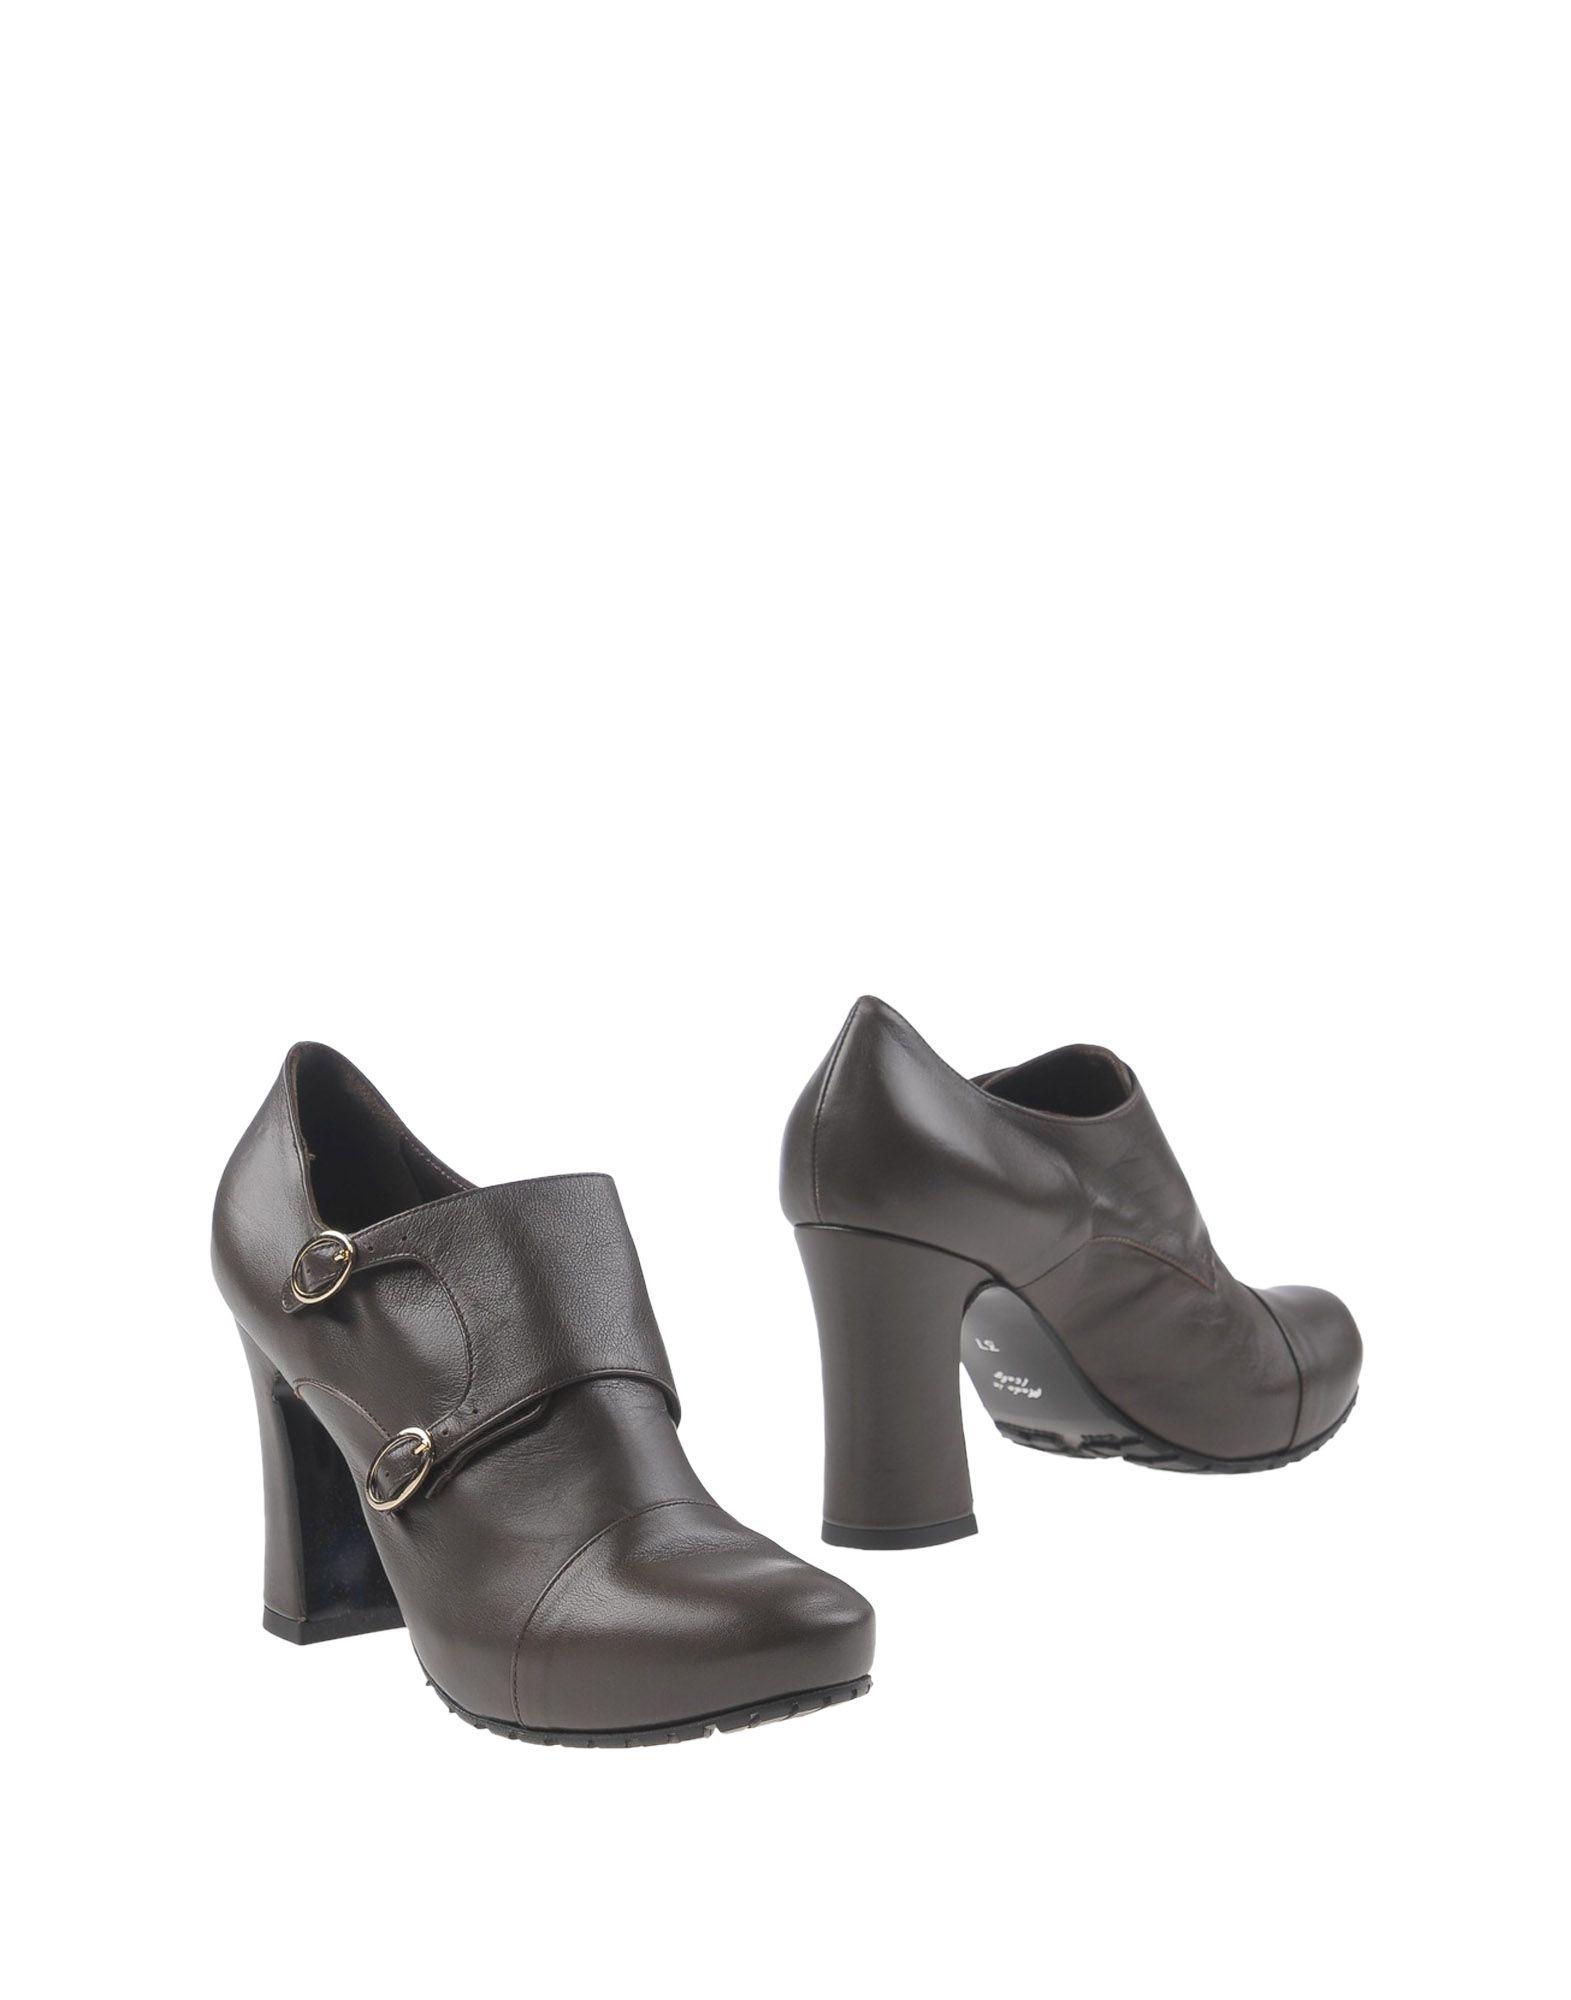 Gionata Stiefelette Damen  11294724OW Gute Qualität Schuhe beliebte Schuhe Qualität e99de3